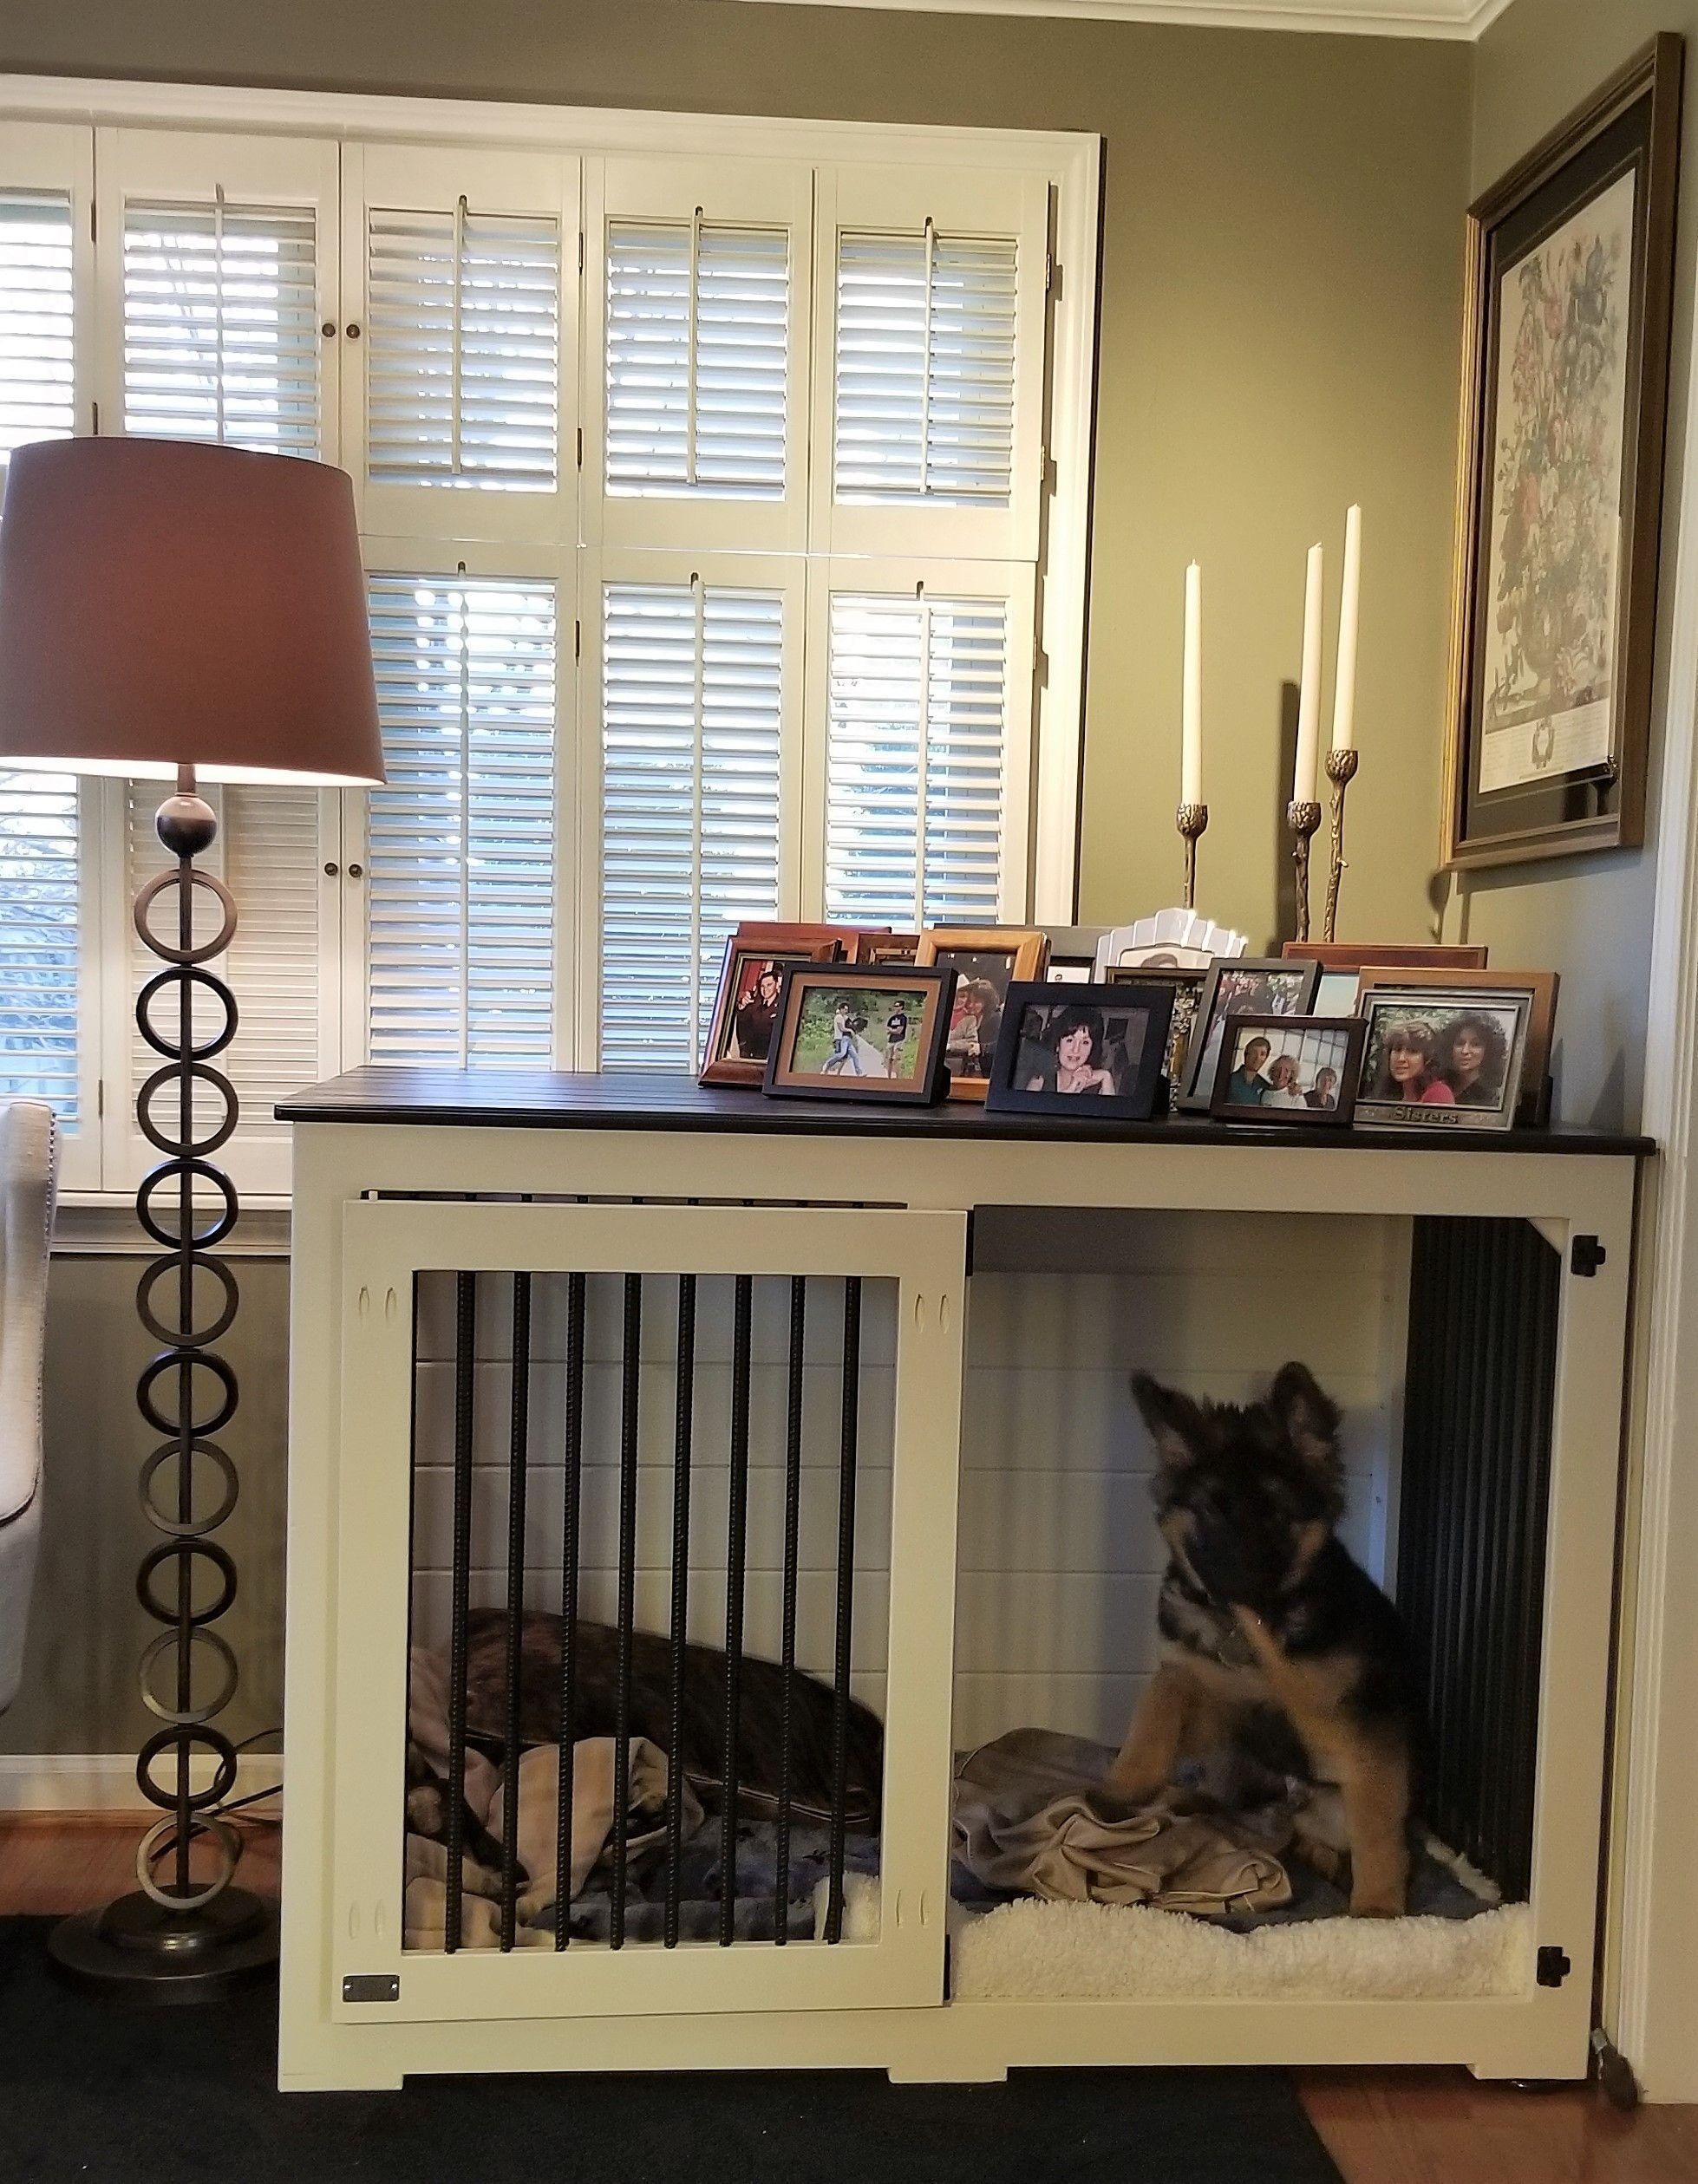 How To Build An Indoor Dog Kennel Building A Dog Kennel Diy Dog